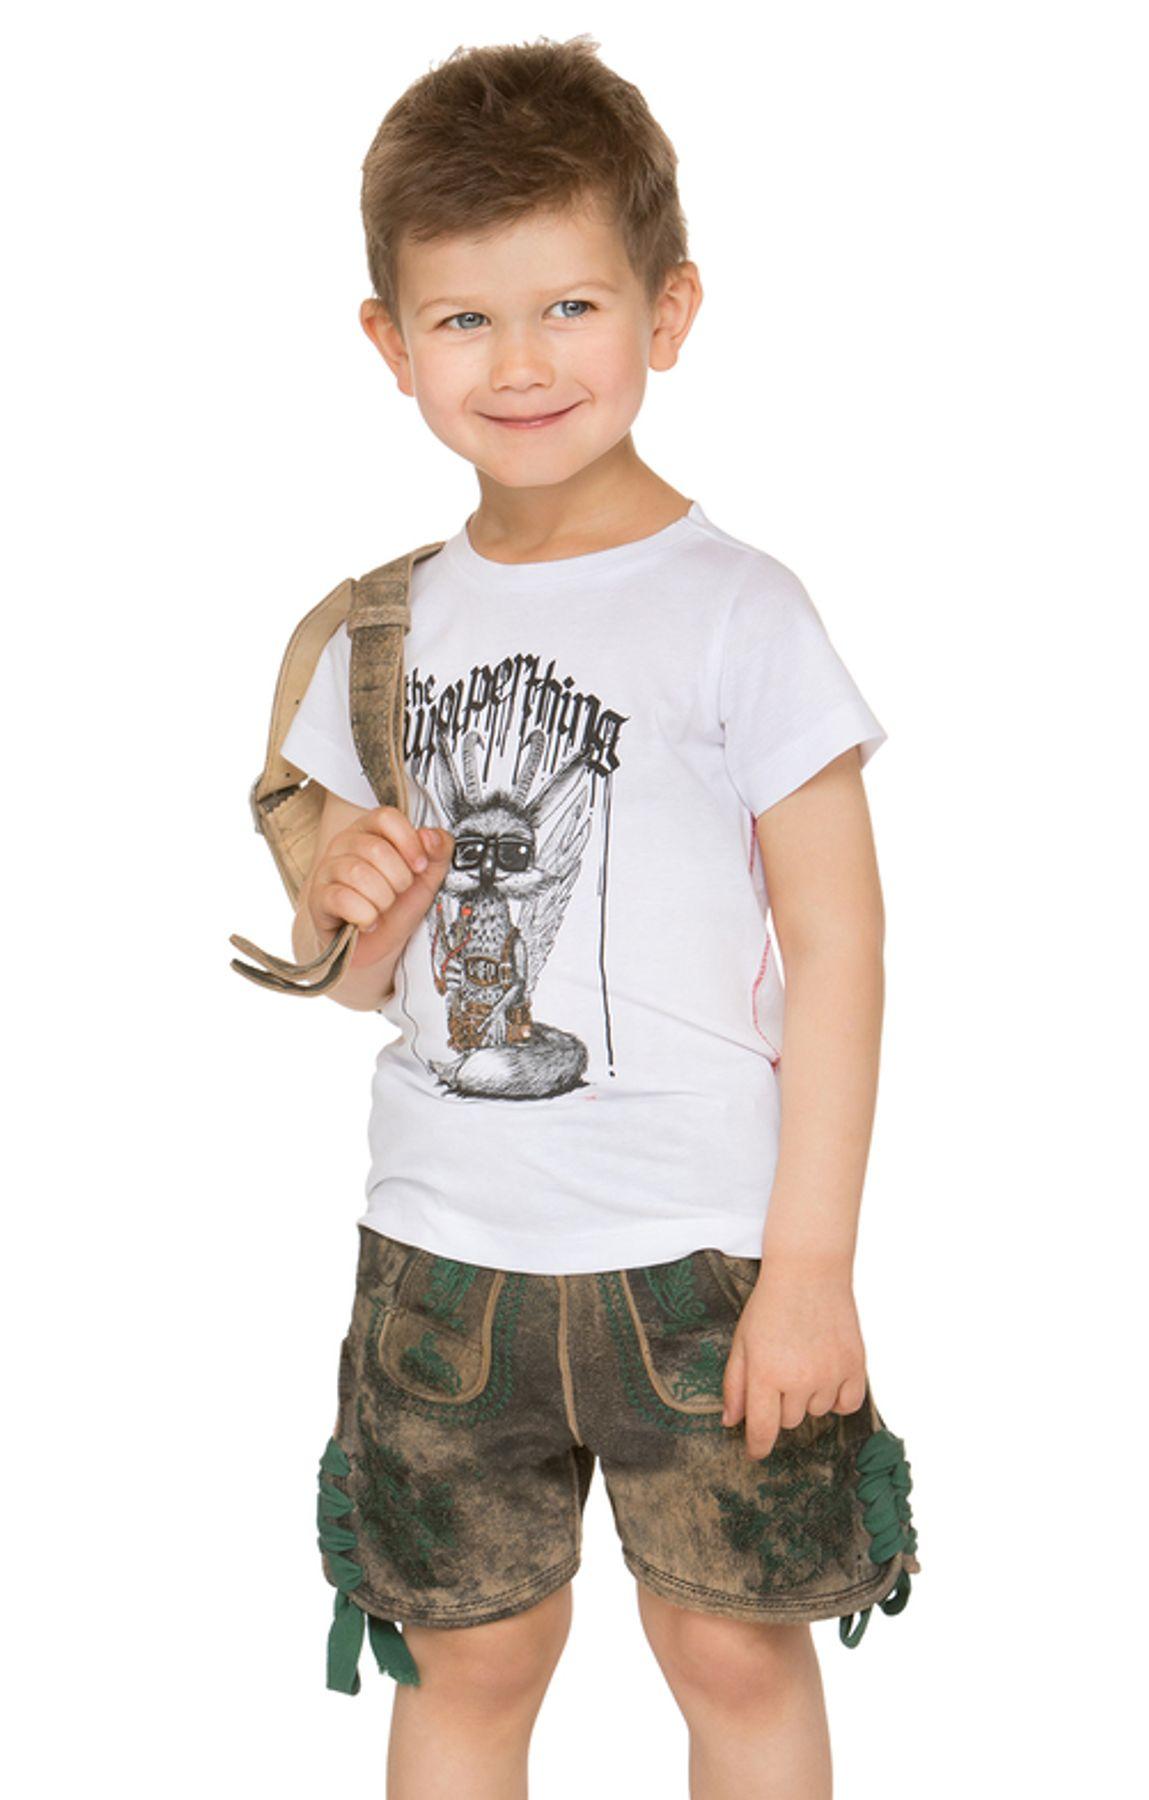 Stockerpoint - Kinder Trachten T-Shirt Wolpiboy, Gr. 86-140 – Bild 10